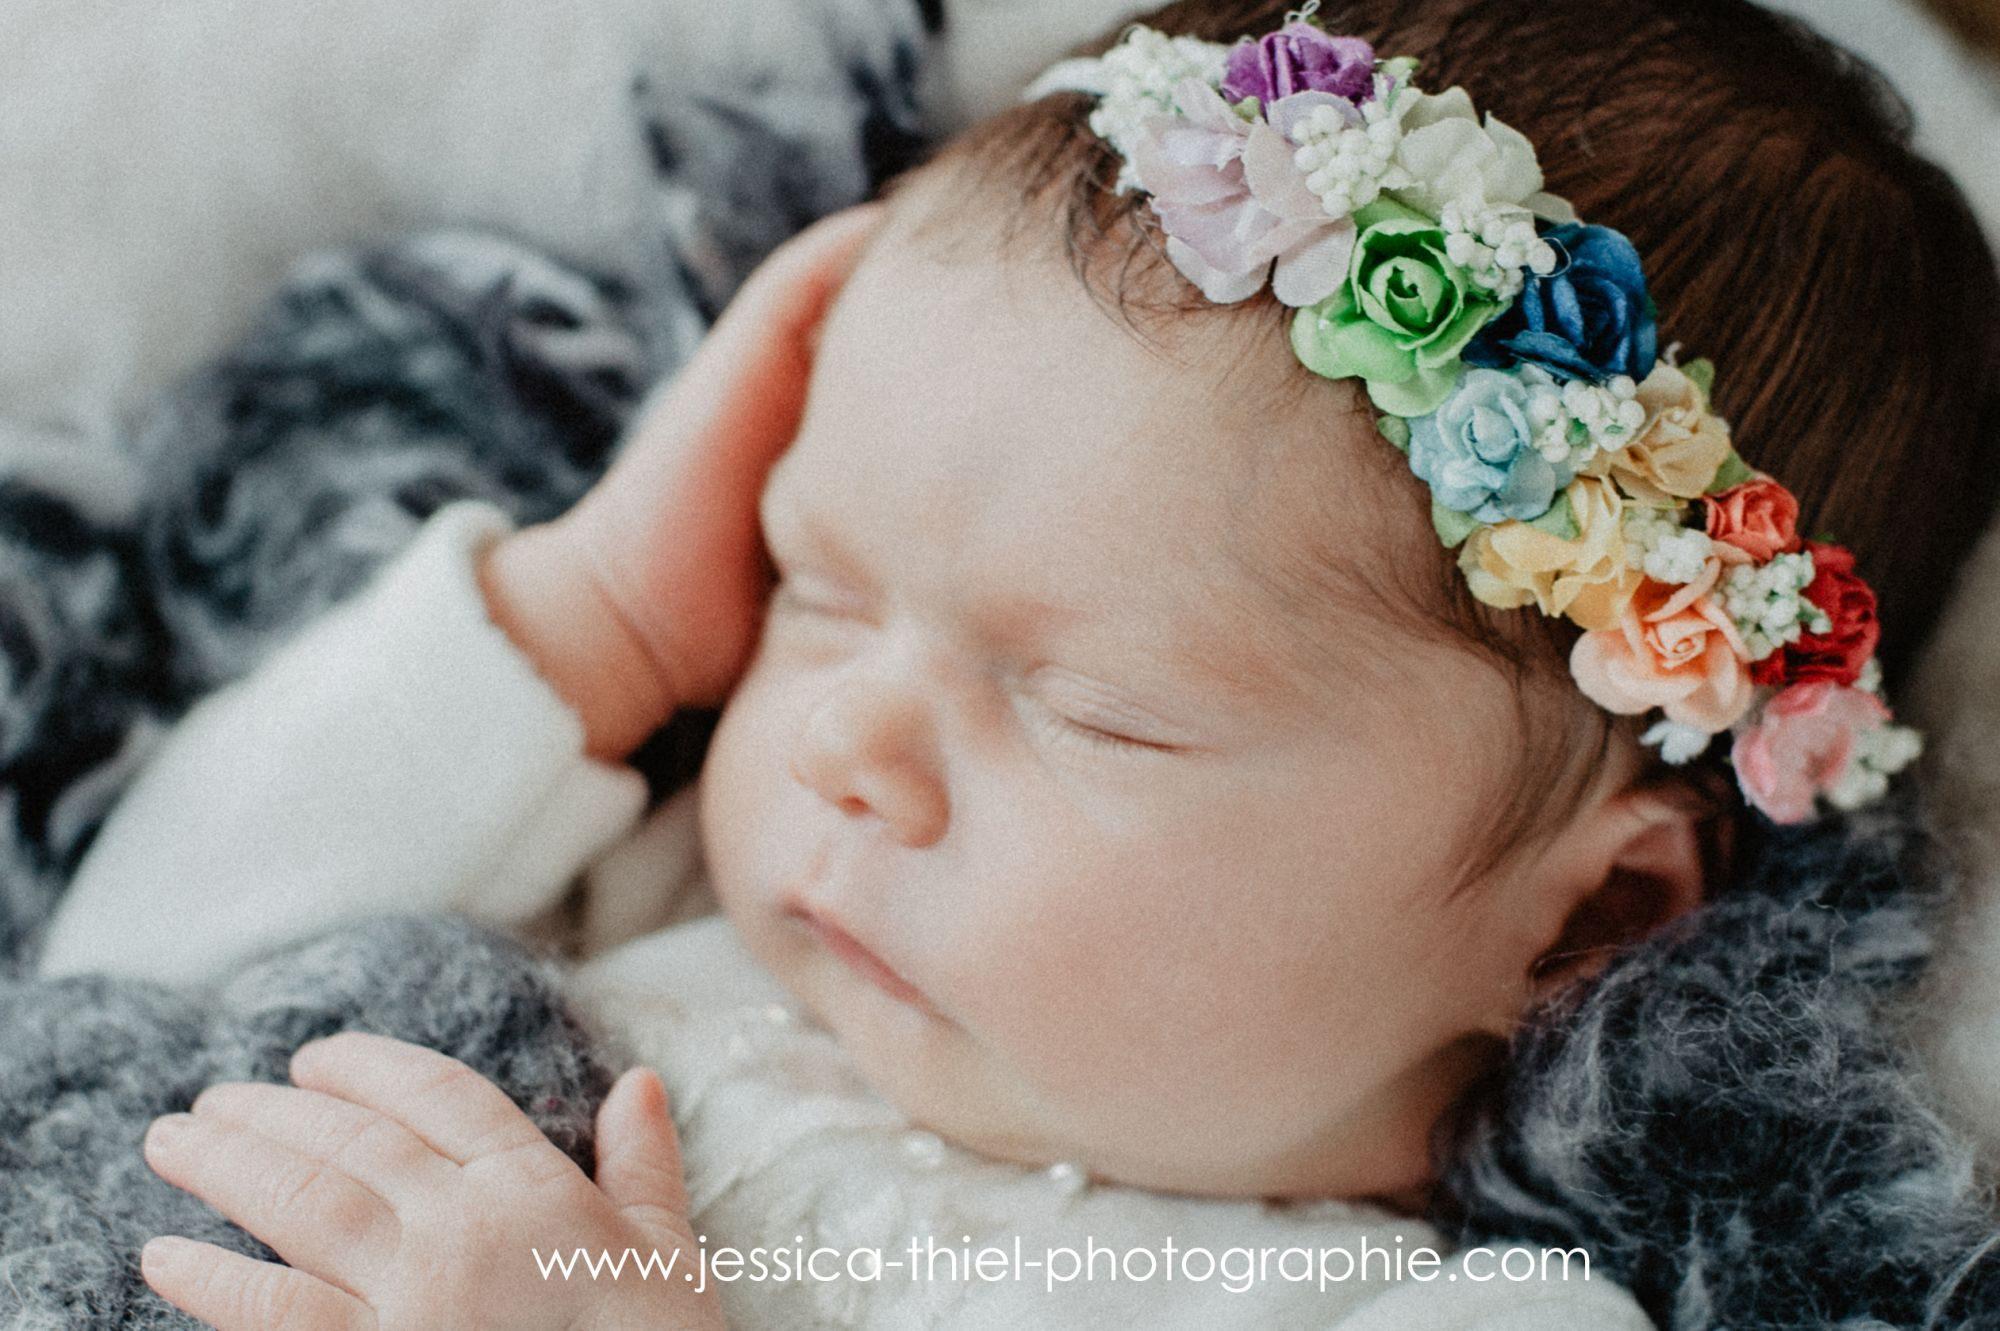 jessica-thiel-photographe-naissance-10